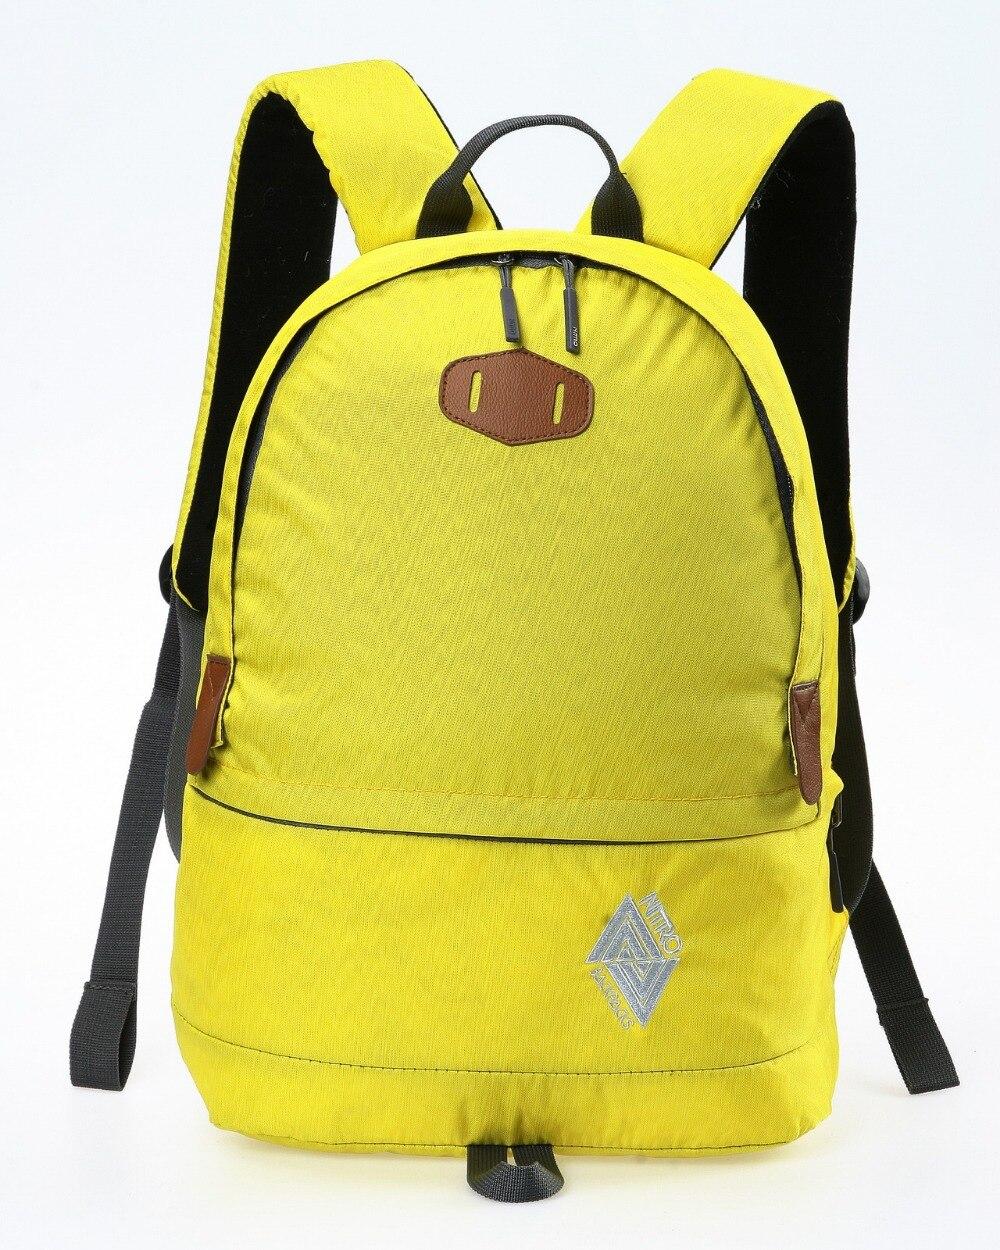 Cevrf рюкзак из германии дамский рюкзак